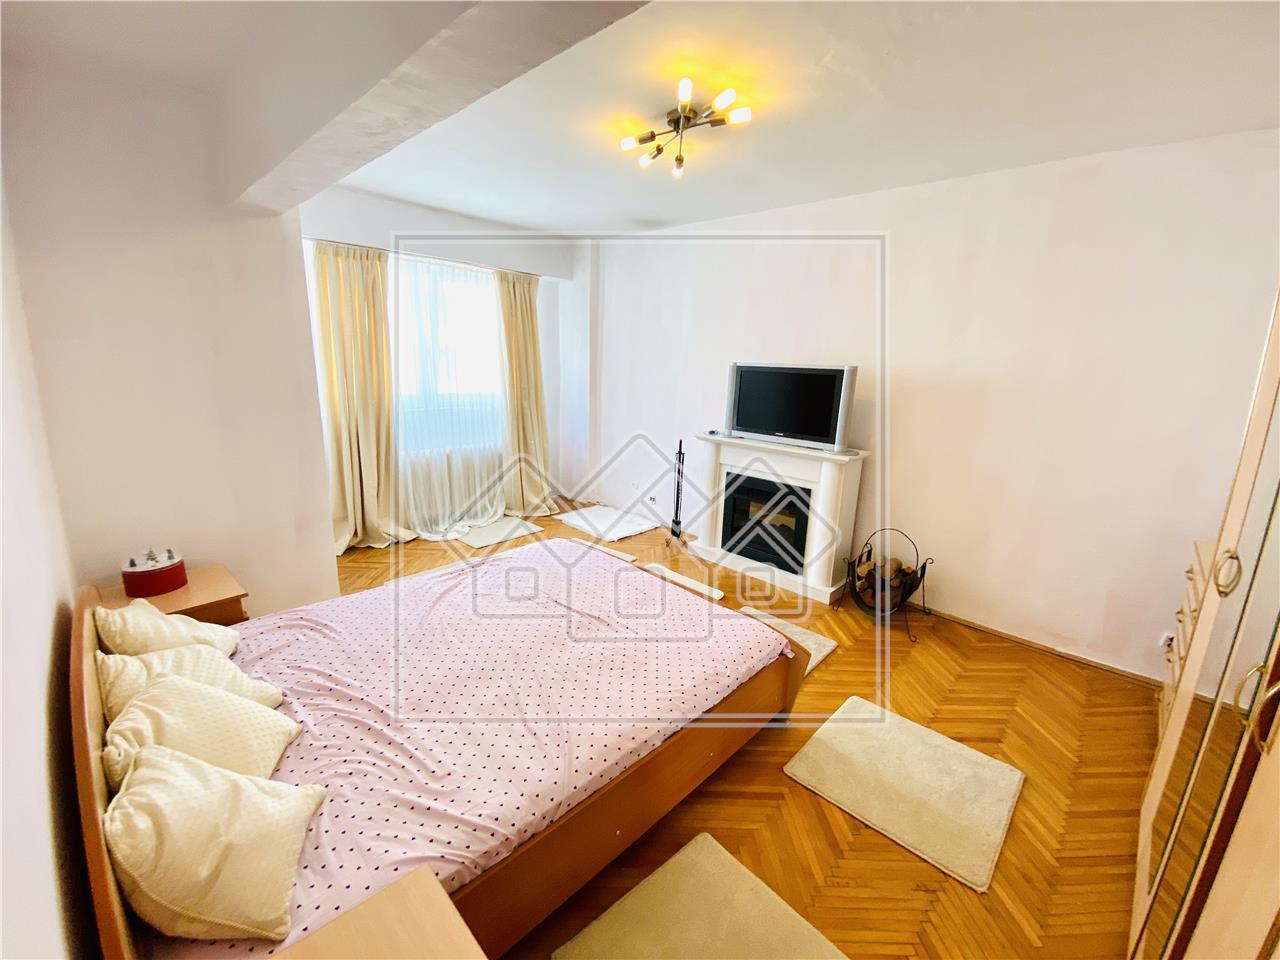 Apartament de vanzare in Sibiu-2 camere cu balcon si pivnita-V. Aurie